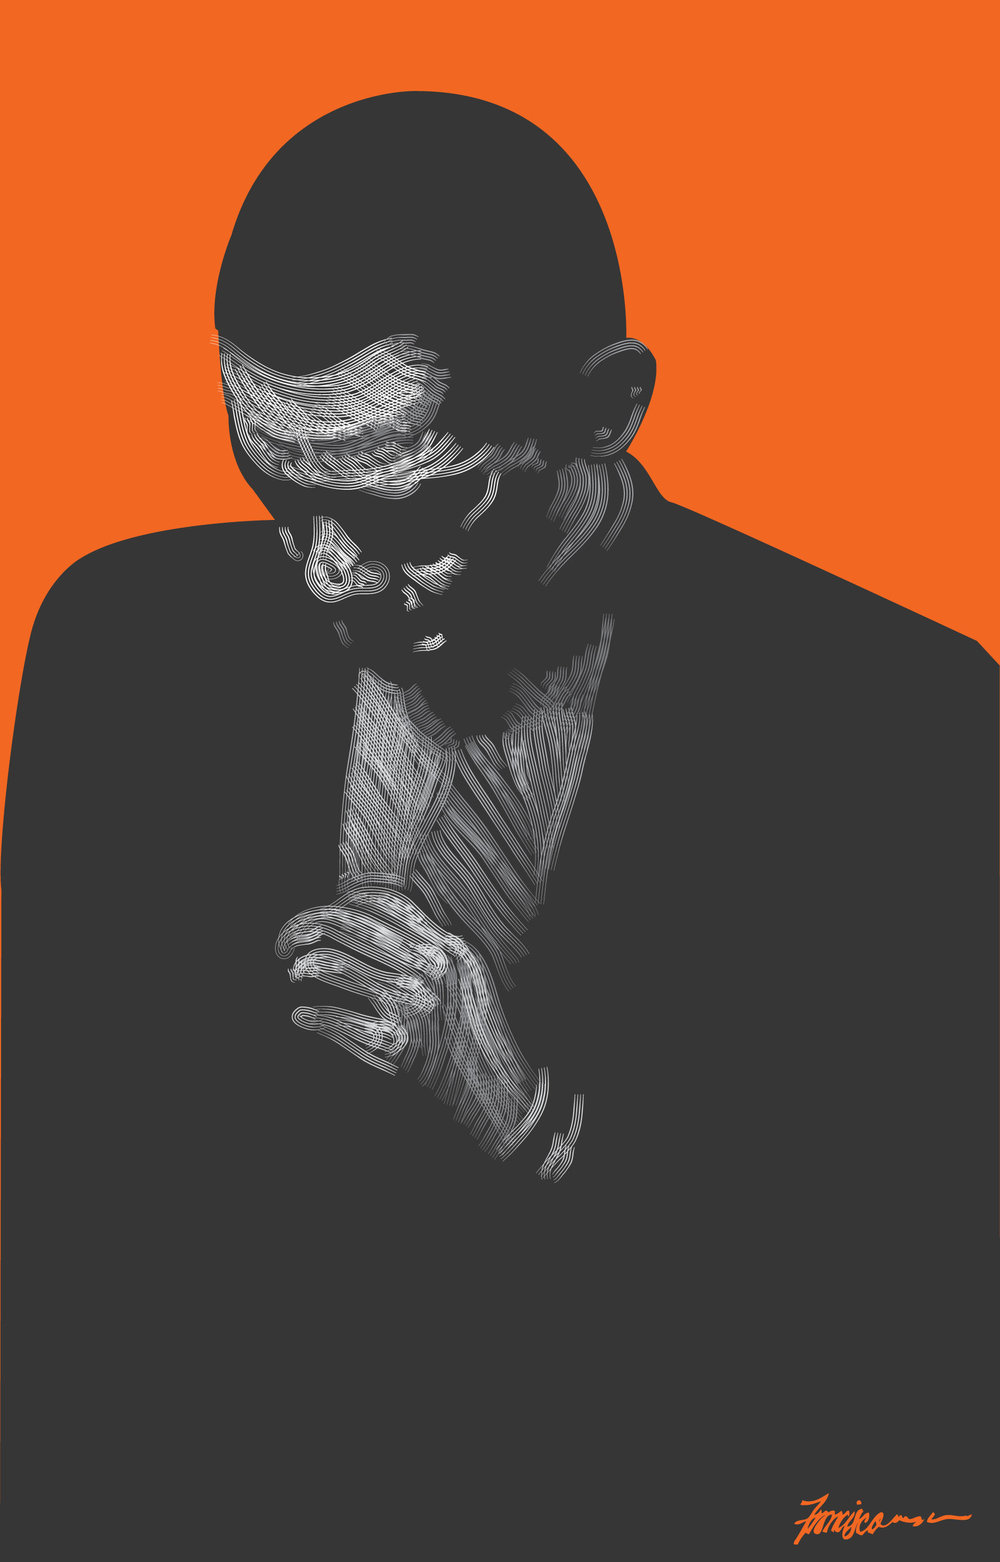 Manny Francisco - ST Illustration  (2016)